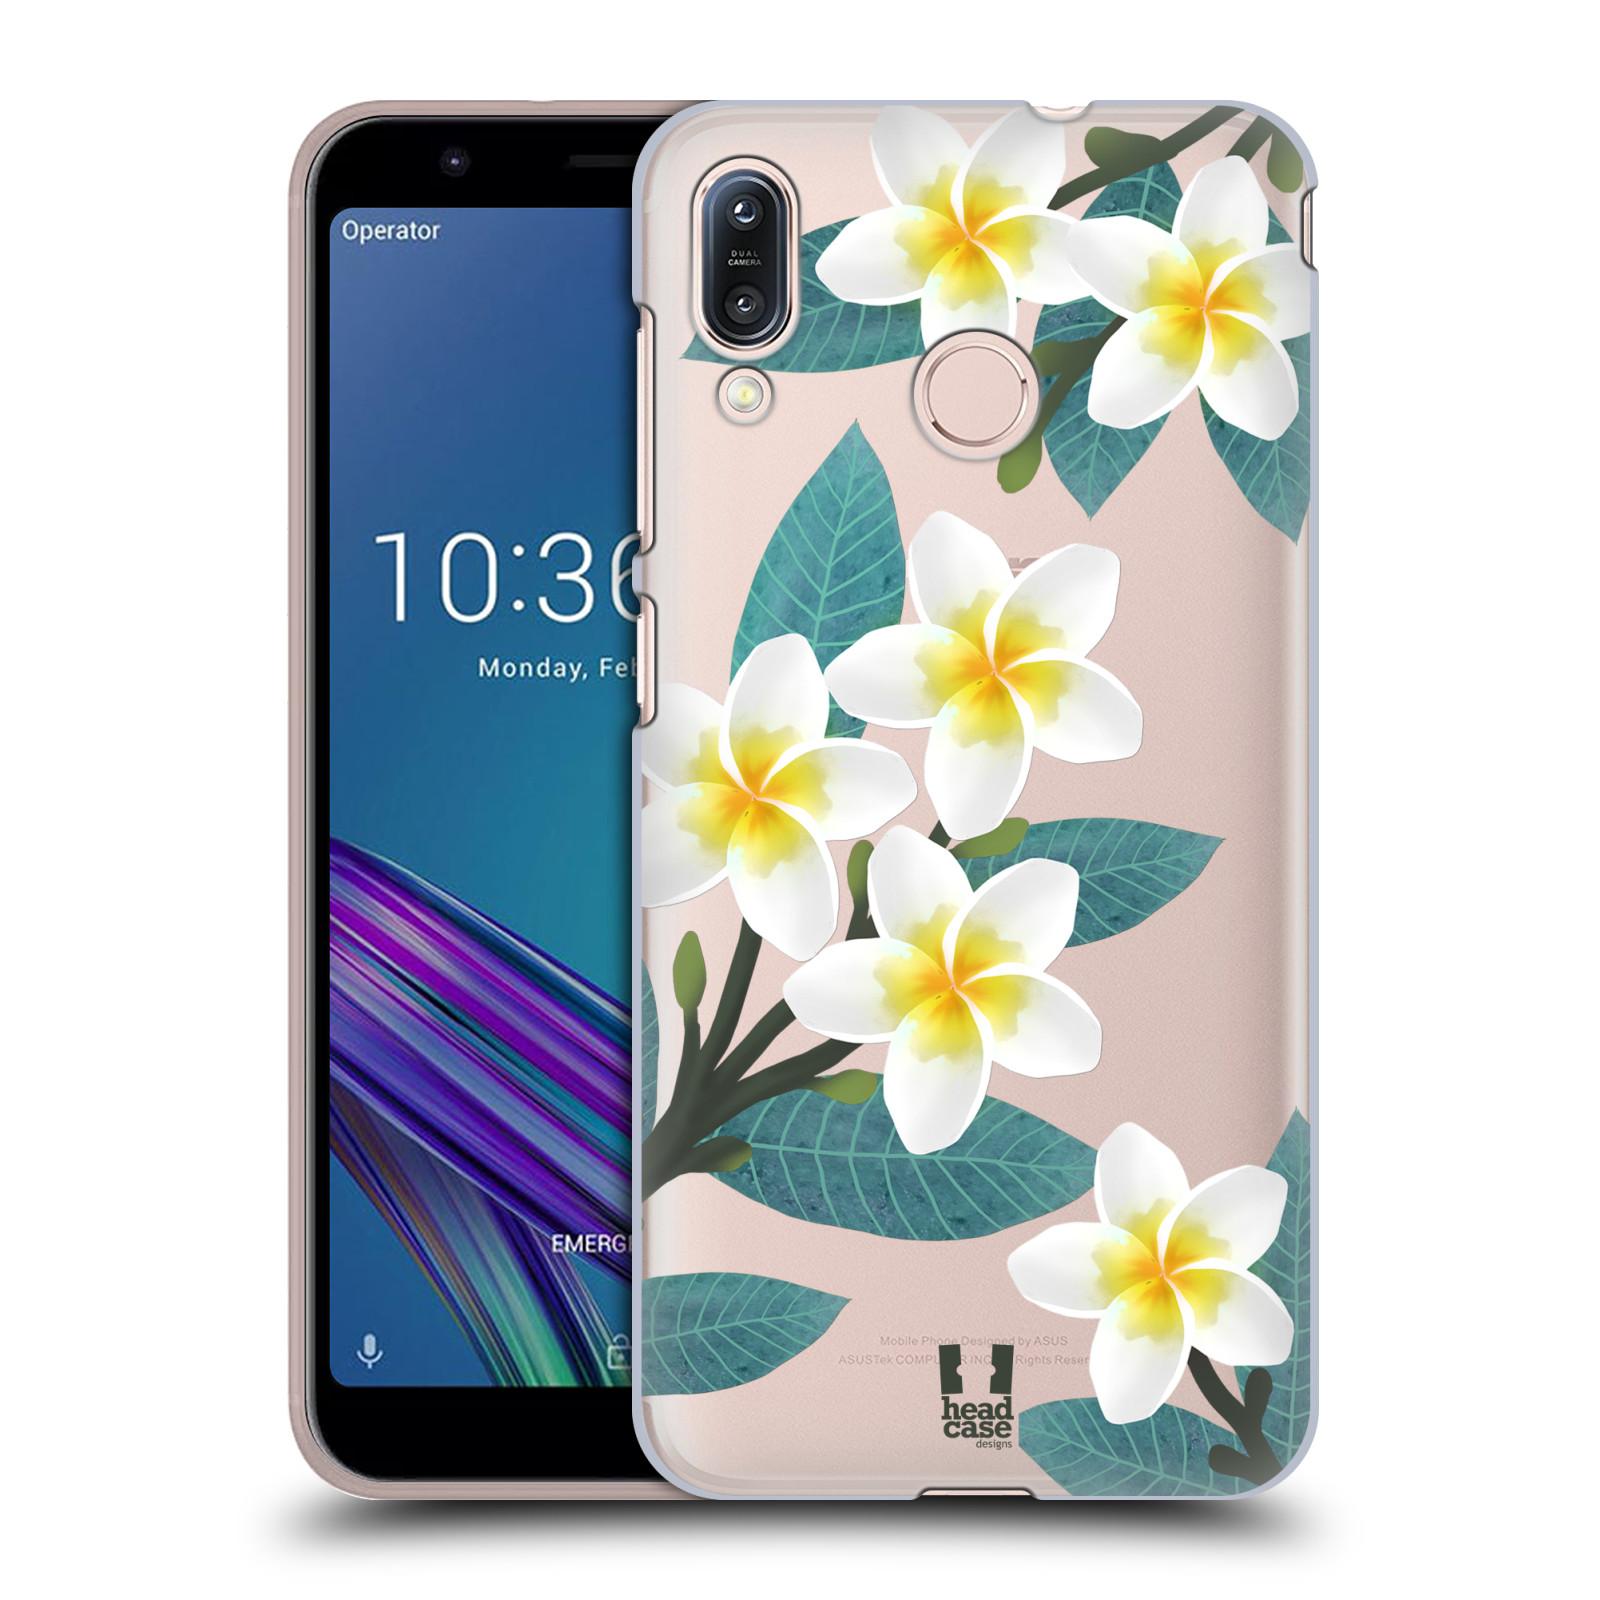 Pouzdro na mobil Asus Zenfone Max M1 (ZB555KL) - HEAD CASE - květinové vzory Plumérie